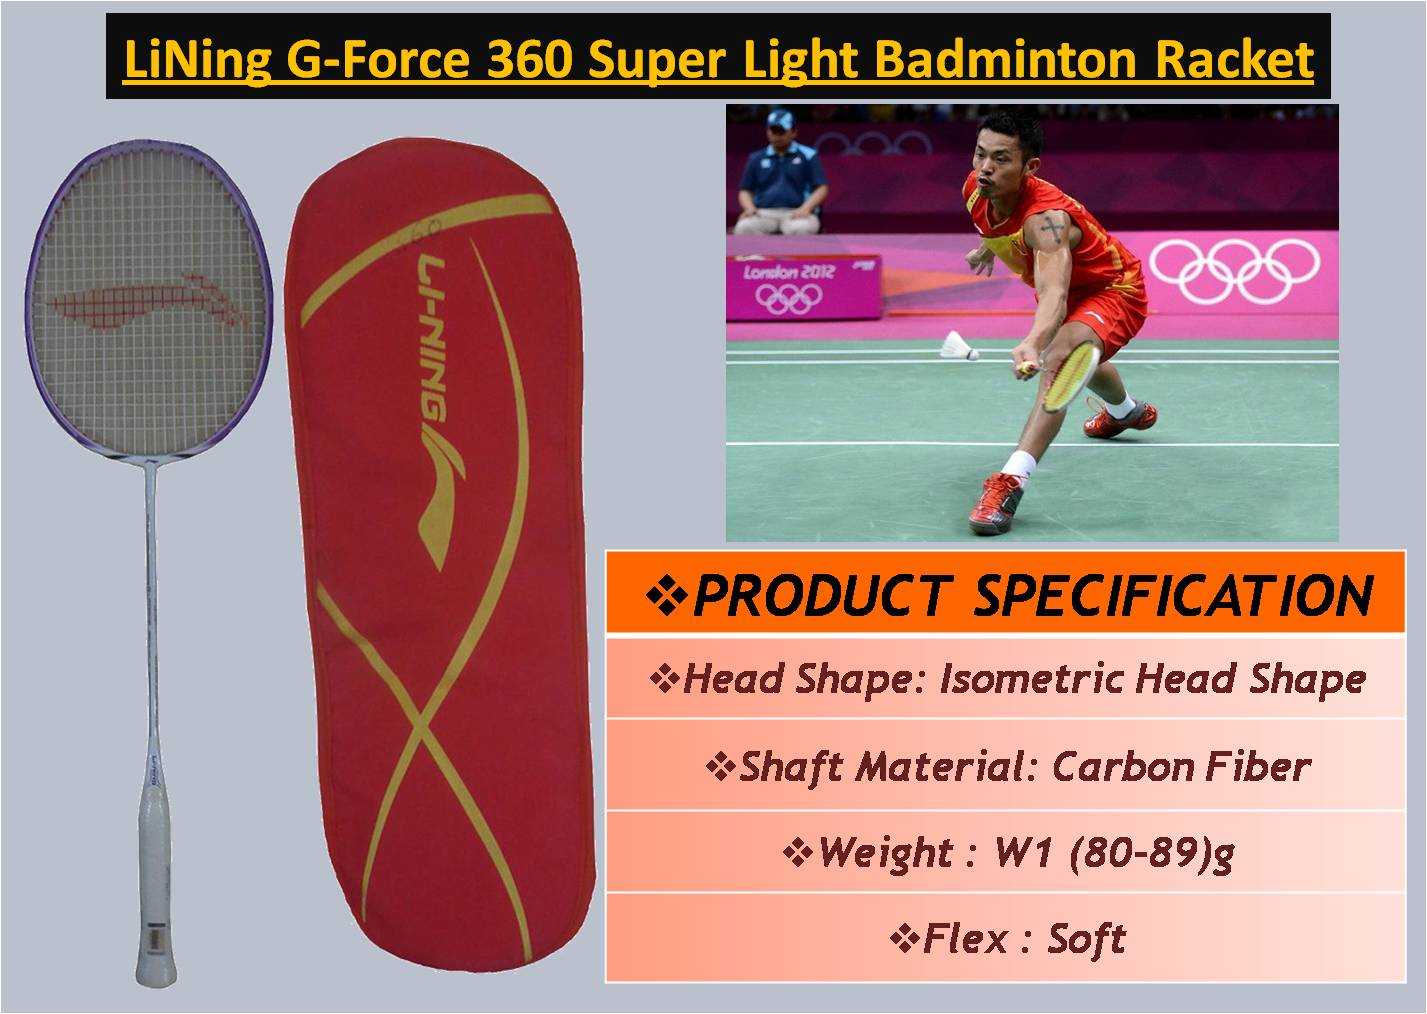 LiNing G-Force 360 Super Light Badminton Racket